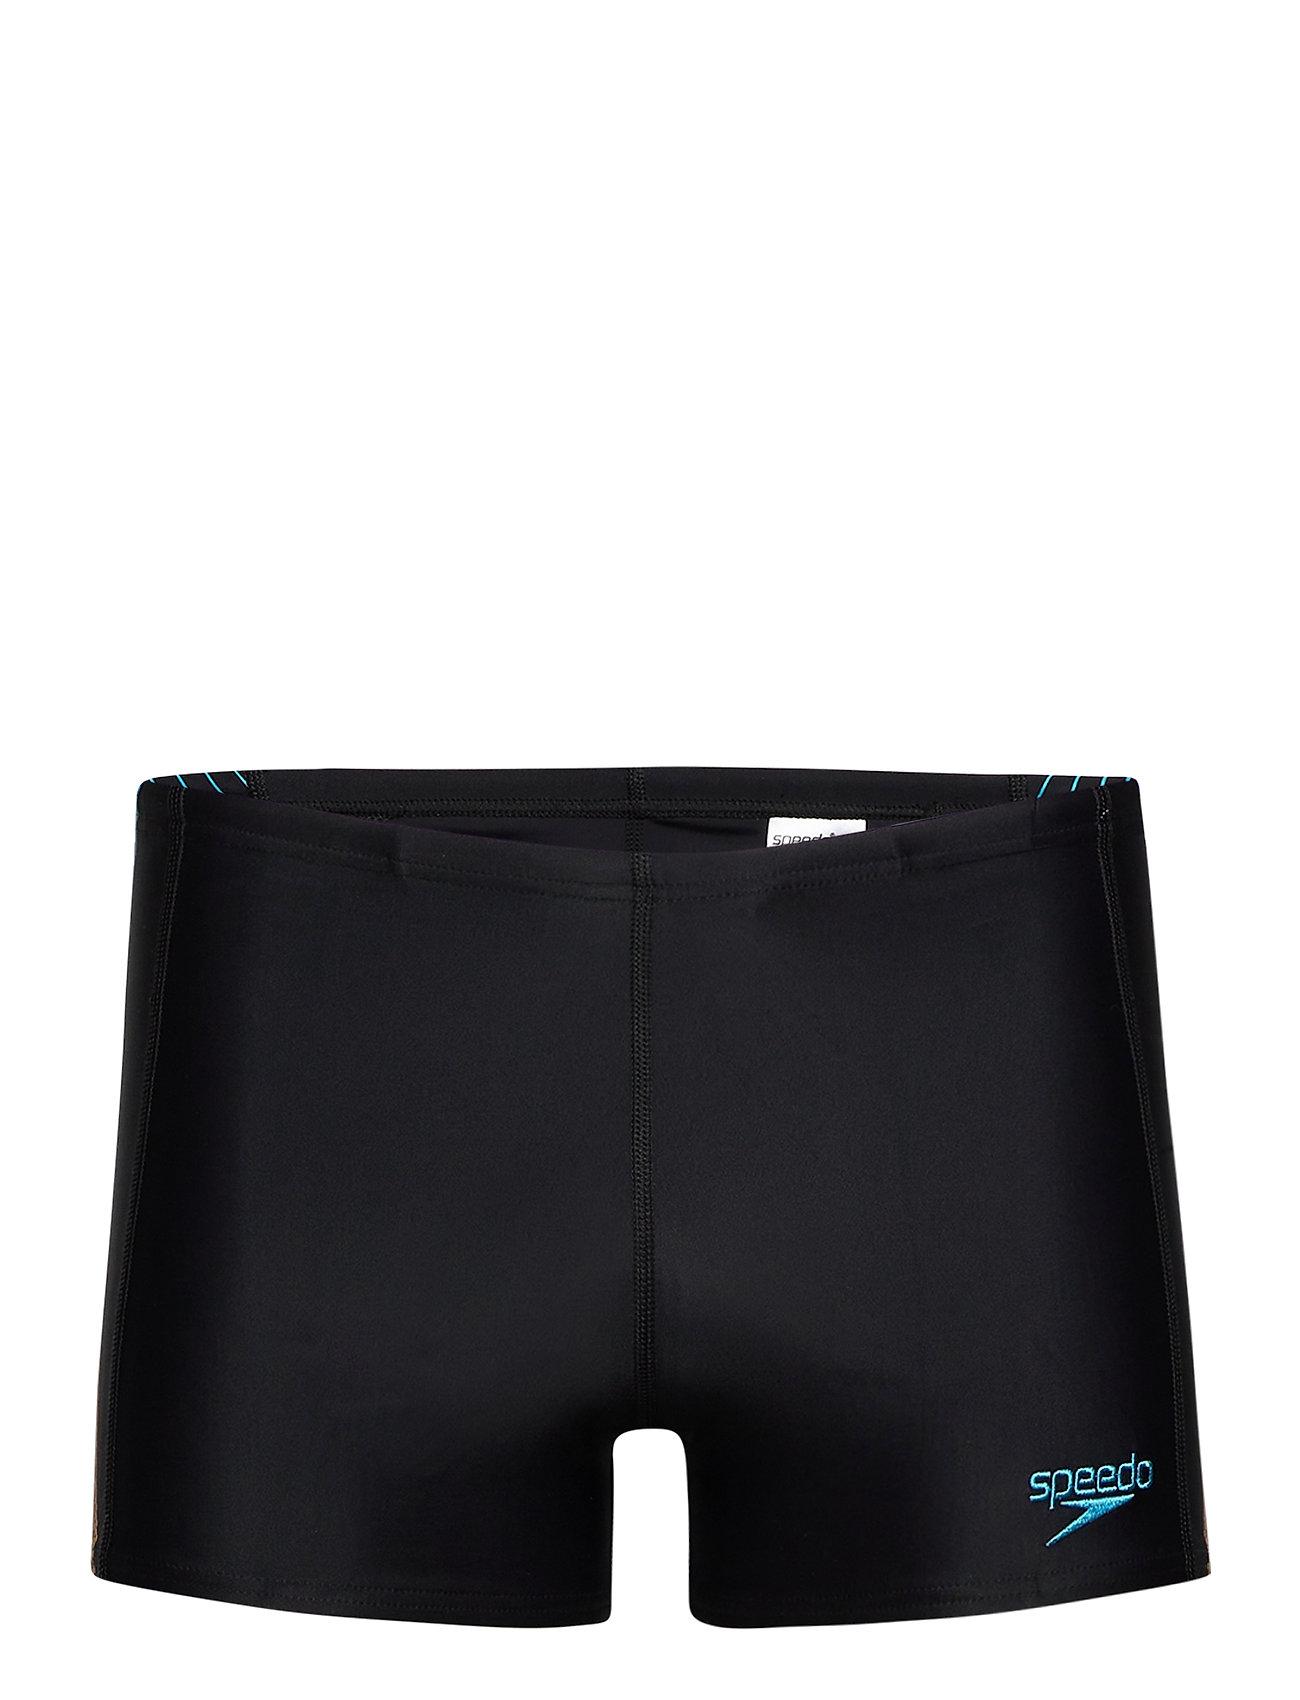 Image of Speedo Logo Endurance Aquashor Black/Turquo 8 Swimwear Briefs & Speedos Sort Speedo (3458925905)